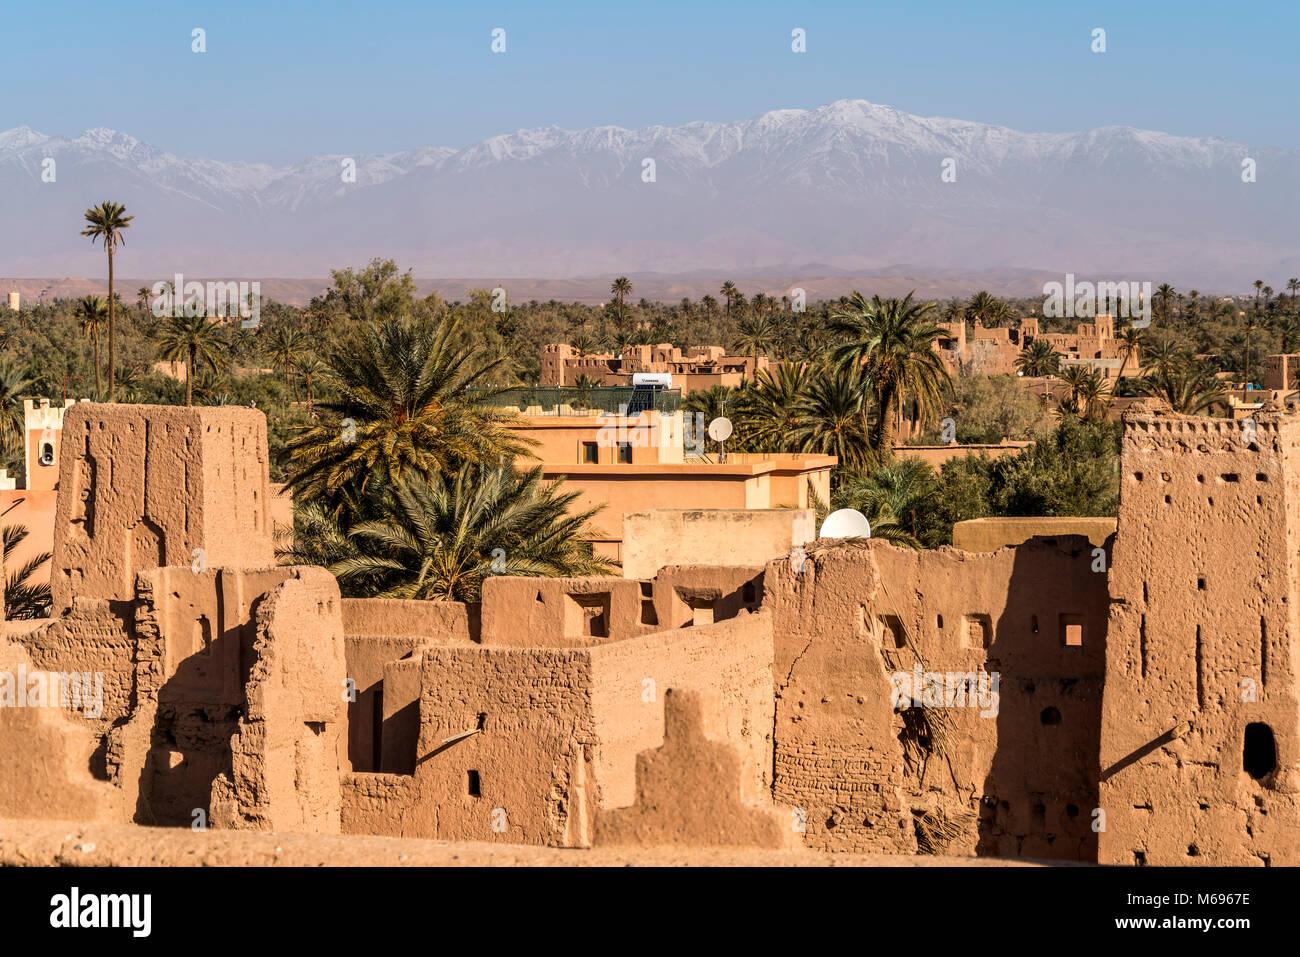 Kasbah Amerhidil oder Imridil und die Palmen-Oase Skoura, Ouarzazate, Königreich Marokko, Afrika     Kasbah - Stock Image